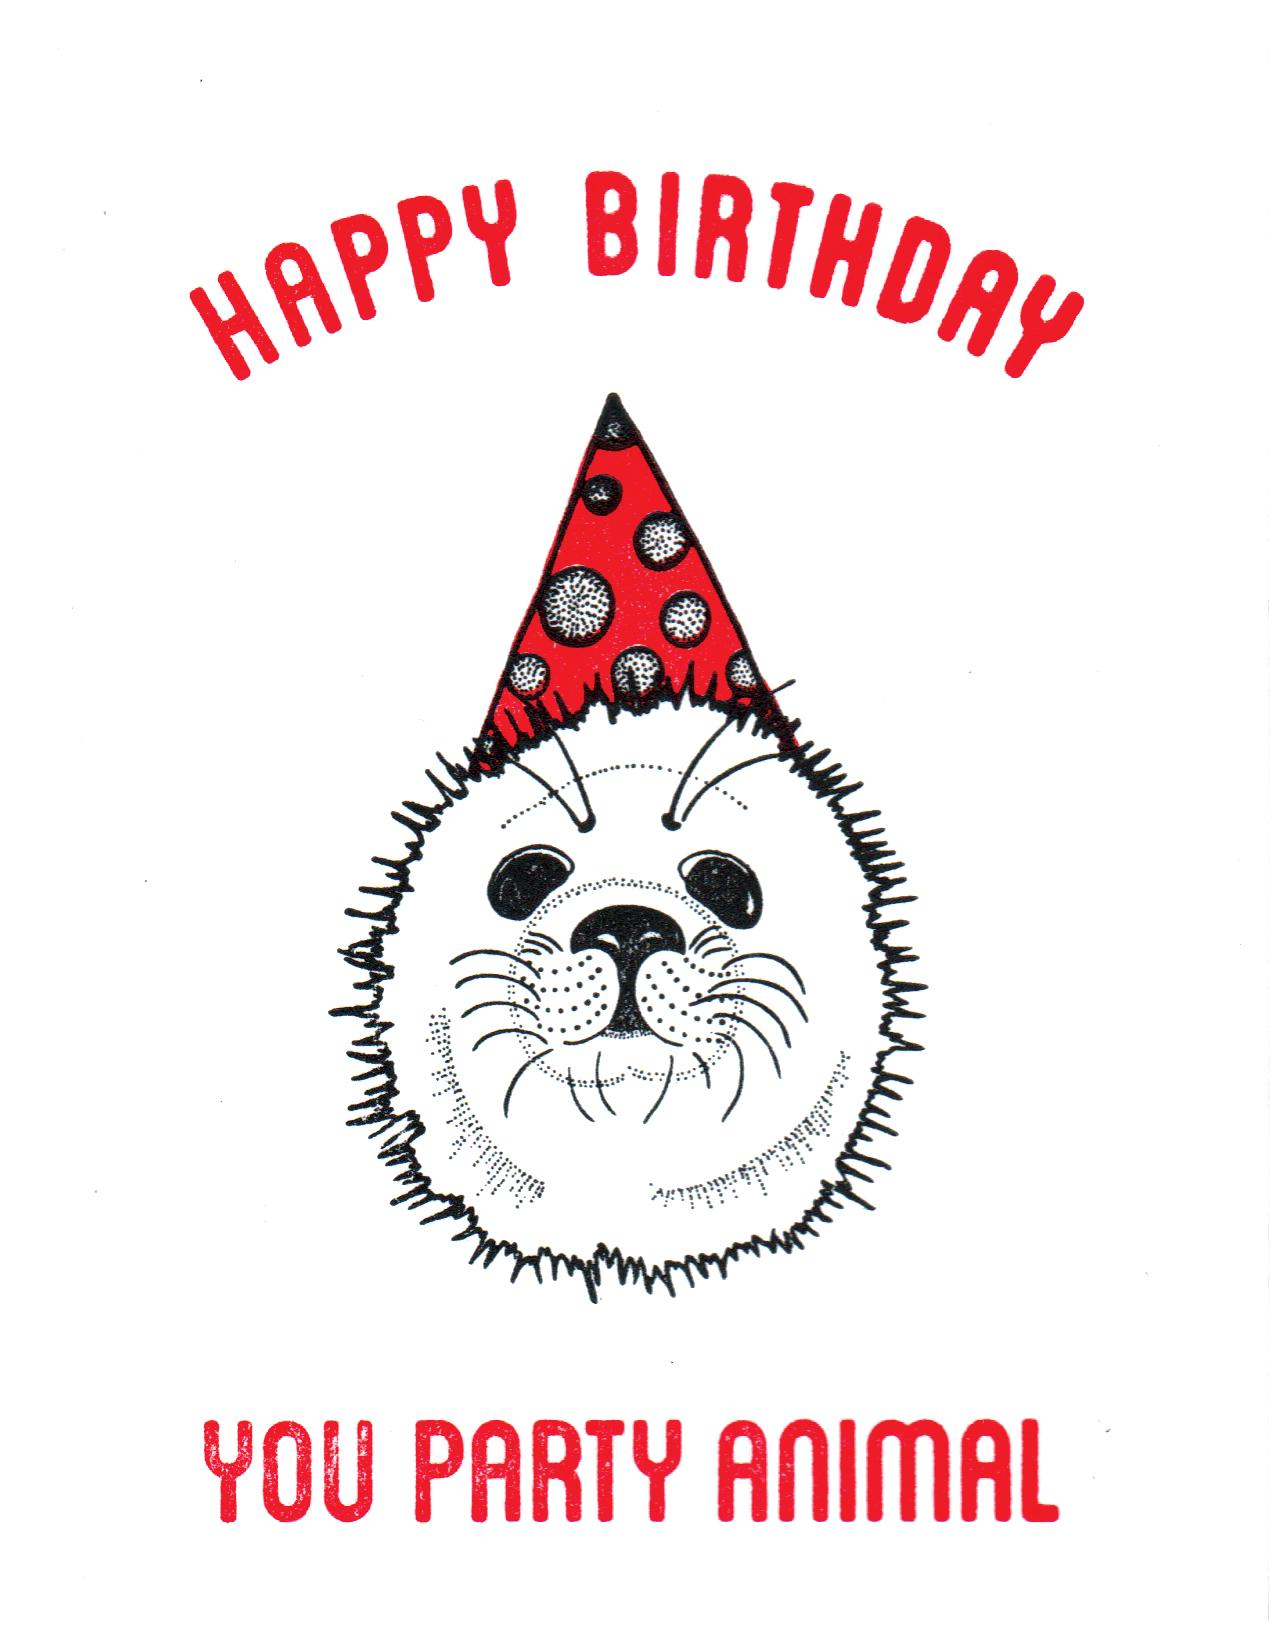 Party Animal - Seal Print